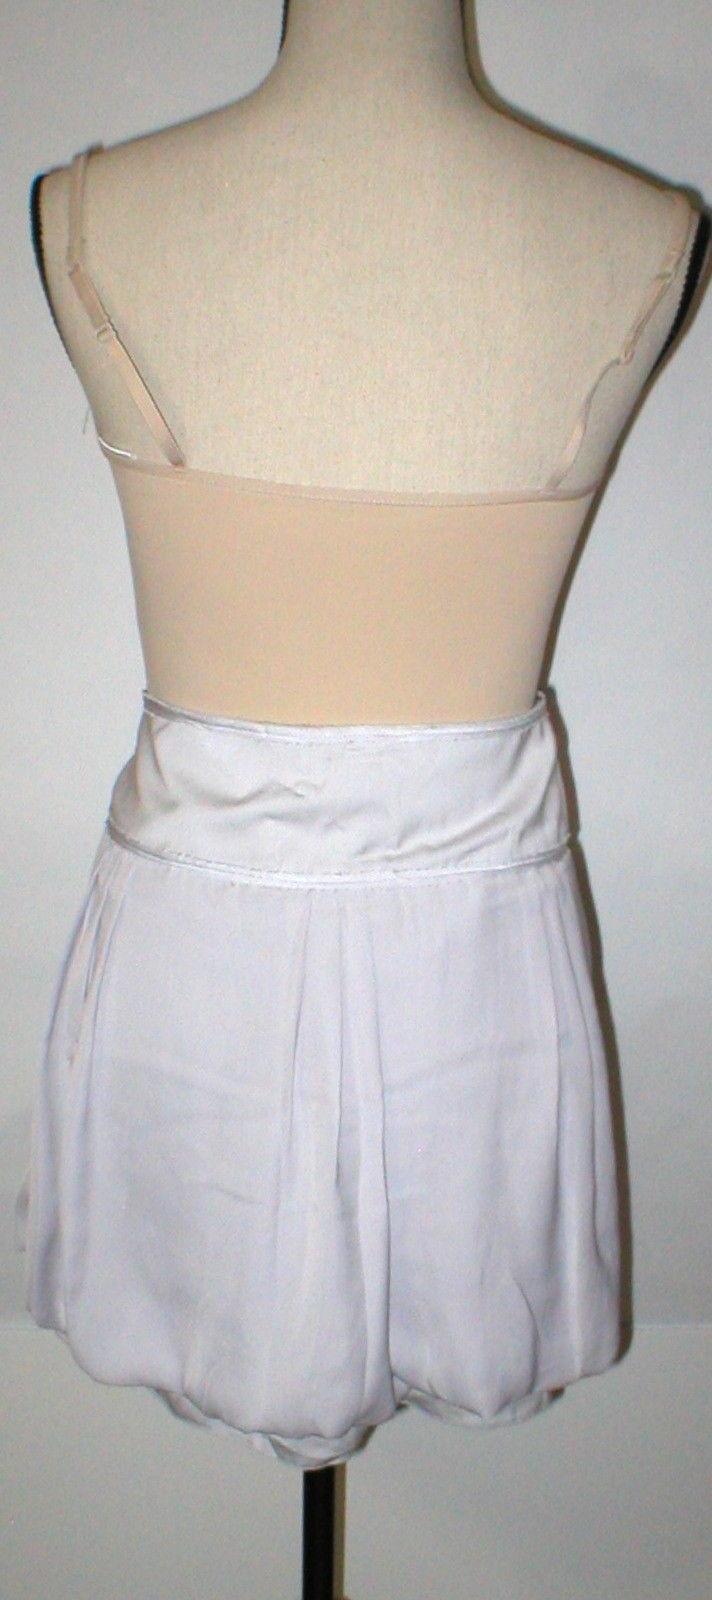 NEW Womens Gap Bubble $50 Skirt NWT 14 Mini Starlight Very light Grayish Purple image 2